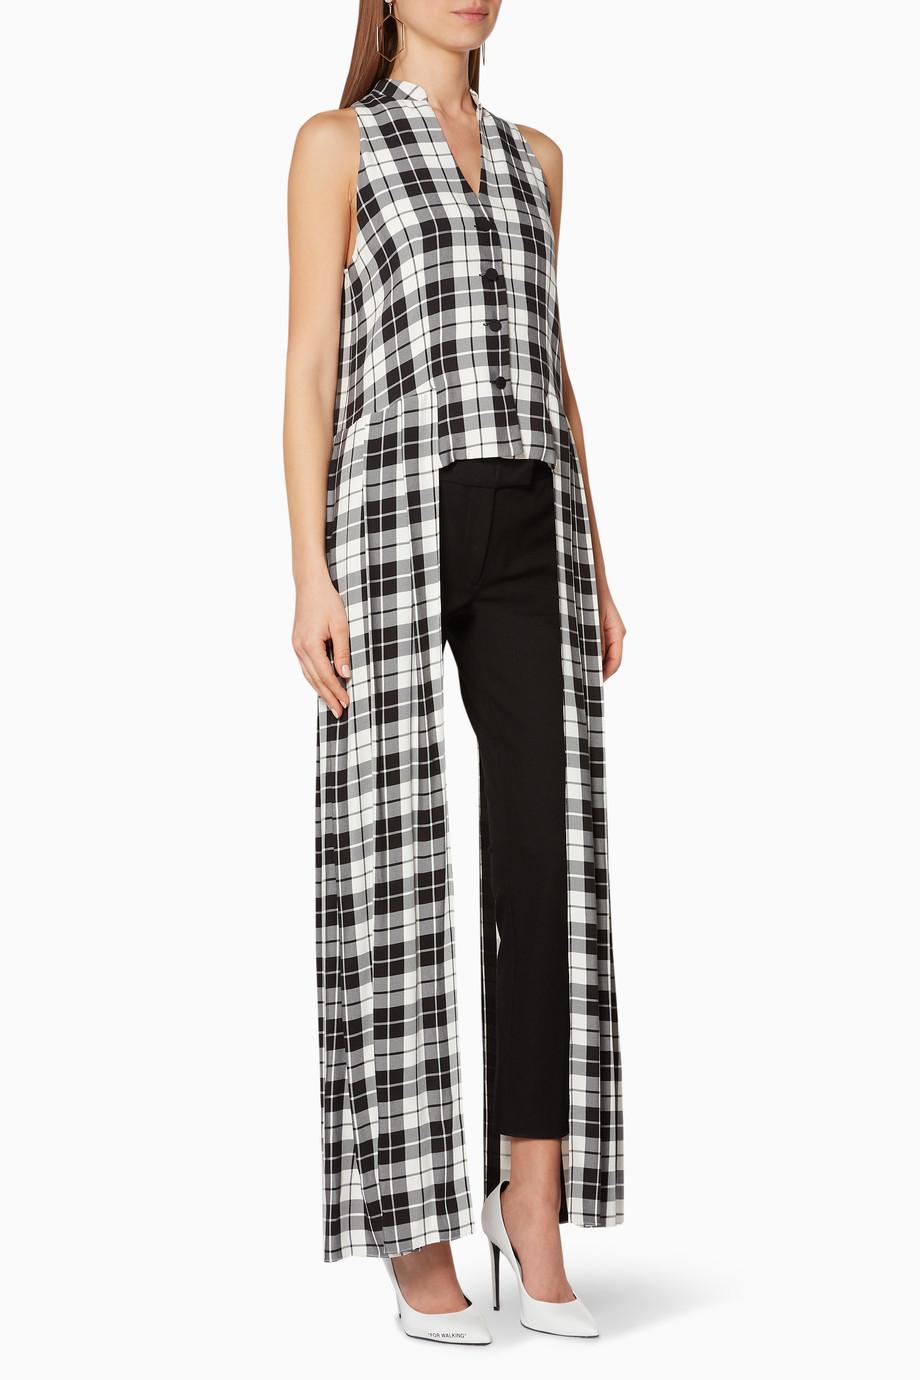 284ac9f2621d2 تسوق فستان بنمط قميص بنقشة مربعات بدون أكمام أبيض وأسود HELLESSY ...